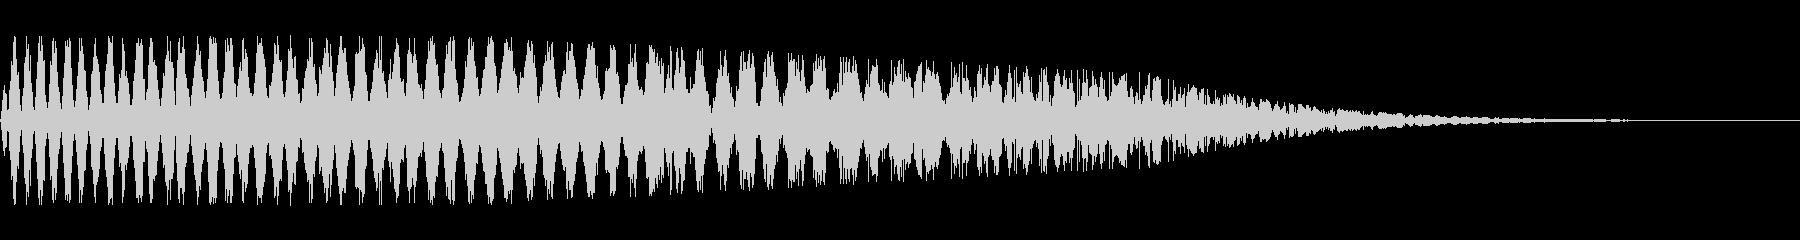 SynthSweep EC06_63_2の未再生の波形